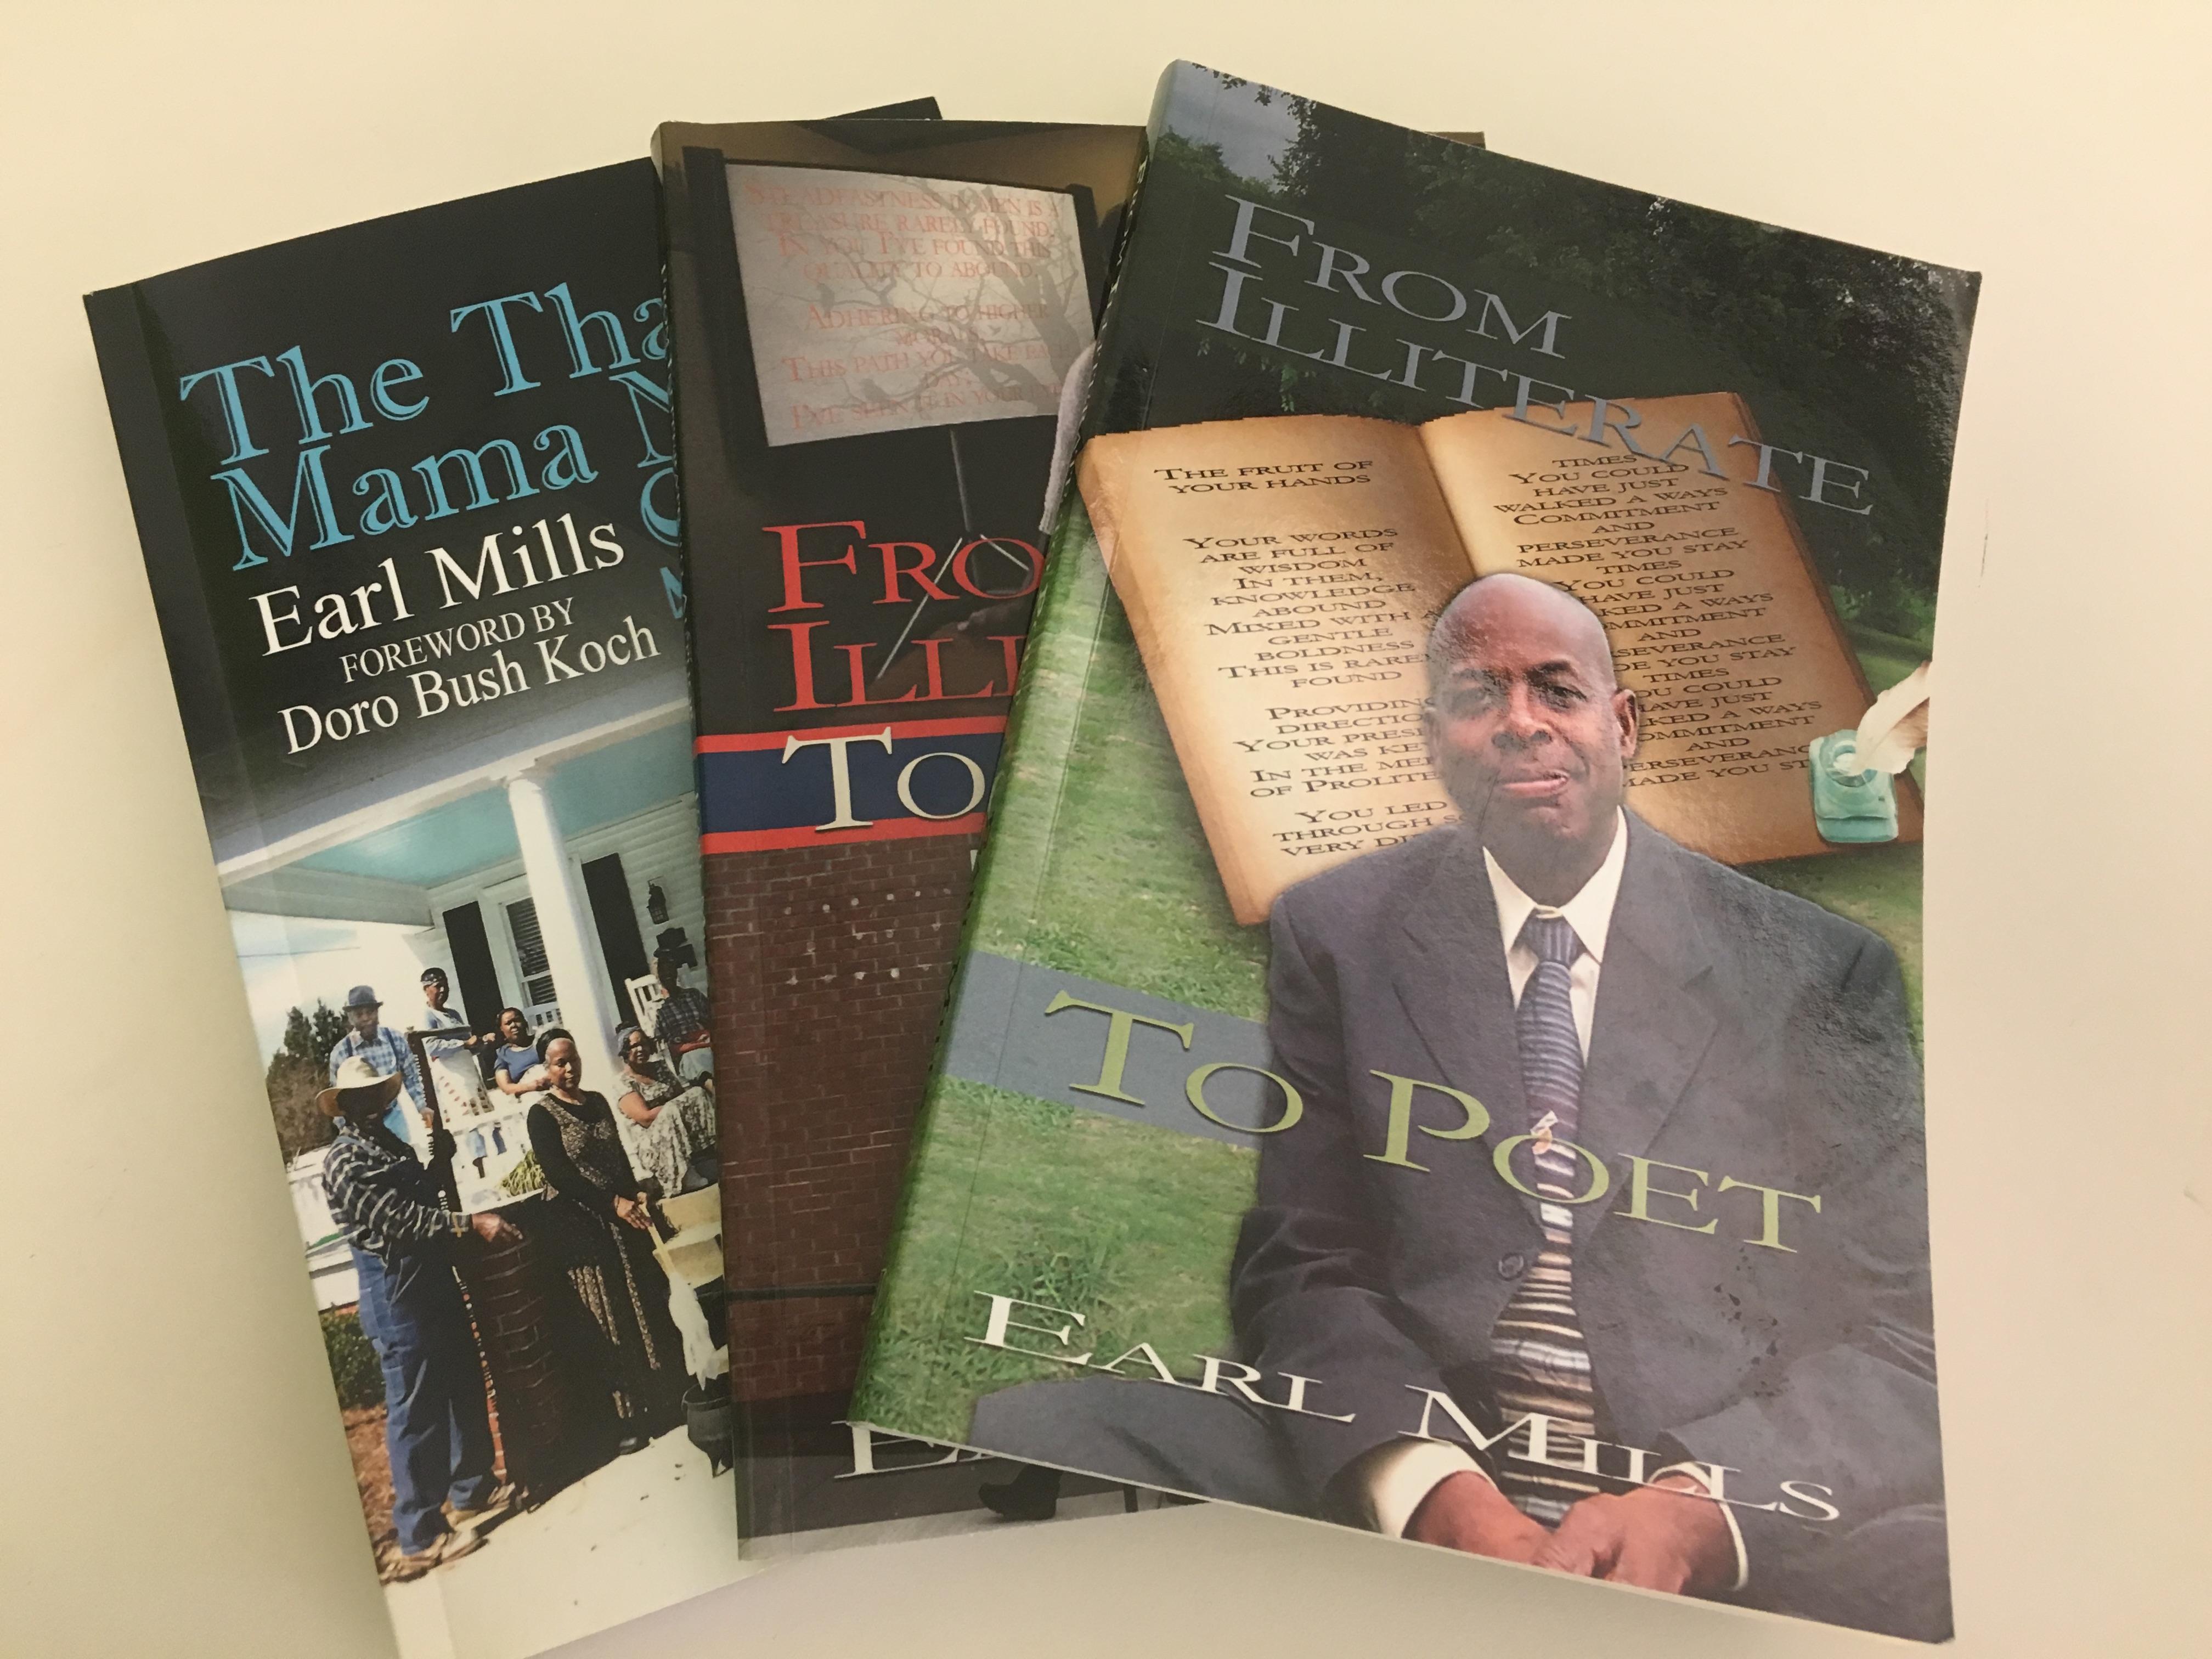 Earl Mills - books